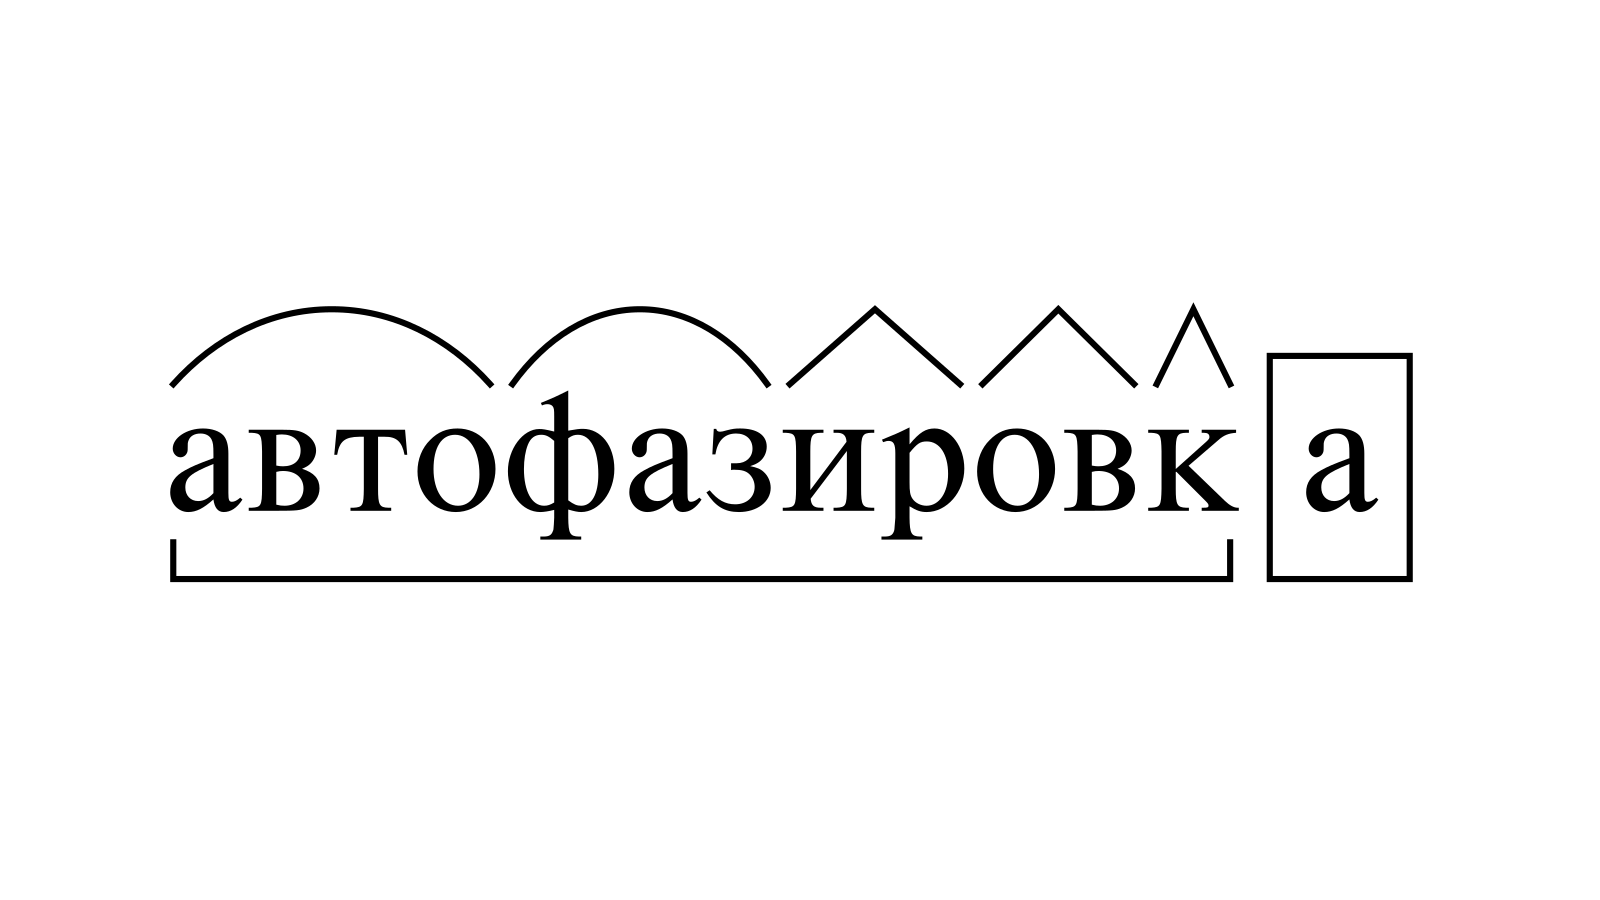 Разбор слова «автофазировка» по составу